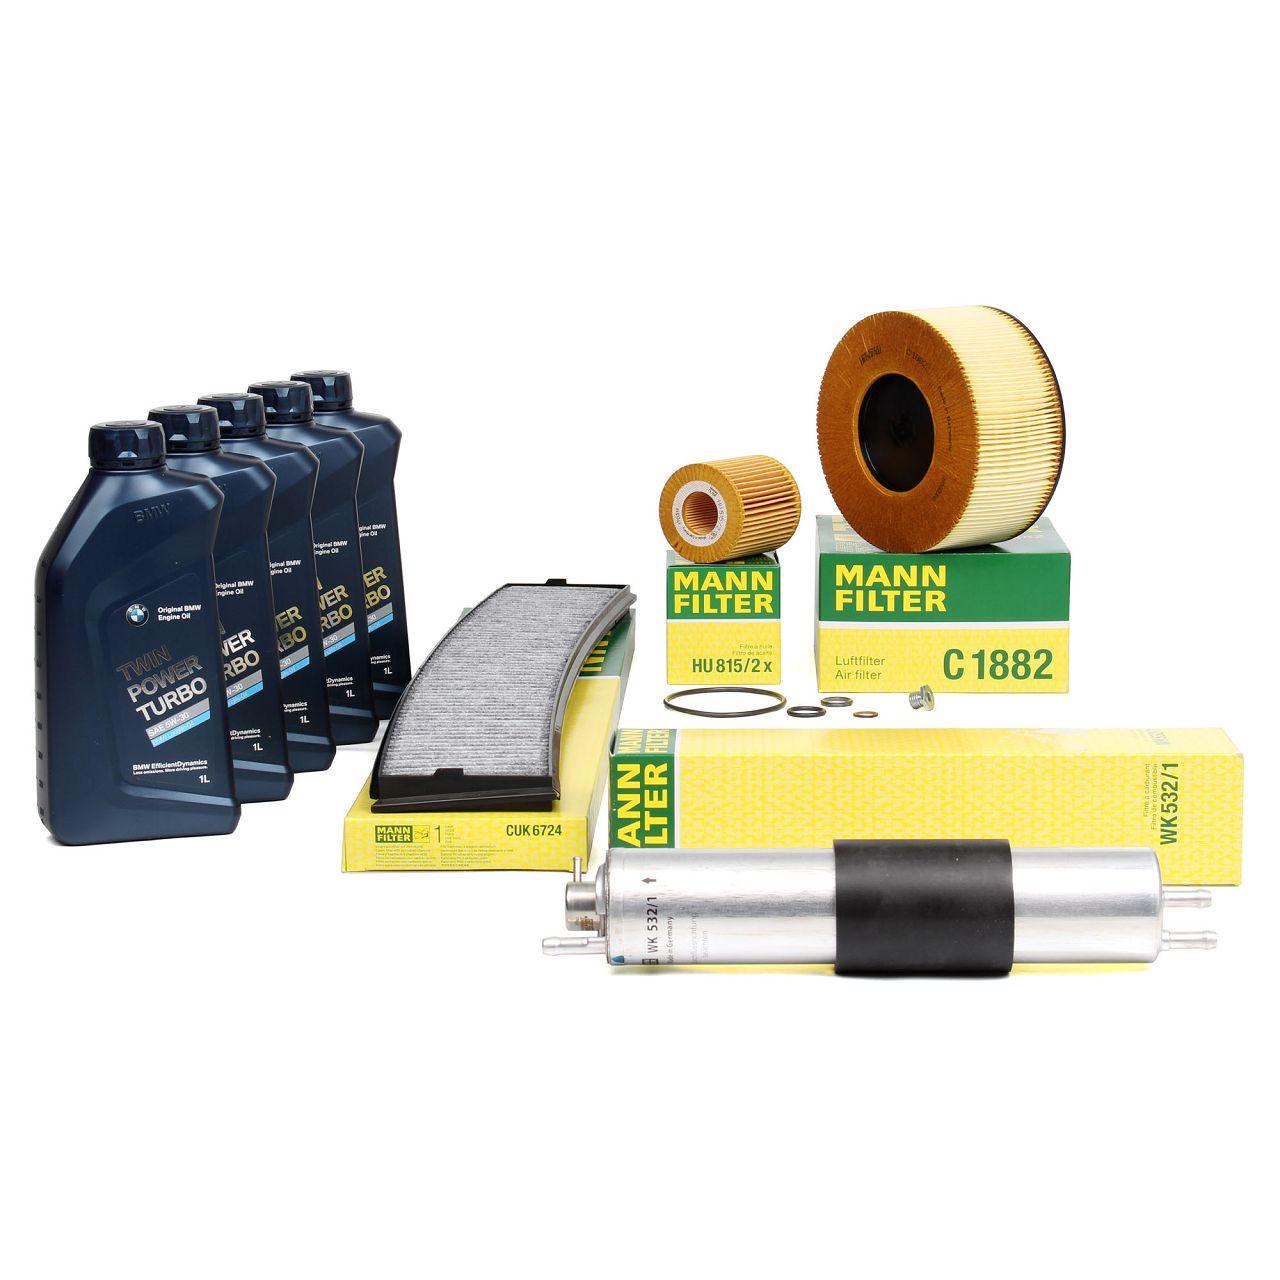 MANN Filterset + 5 L ORIGINAL BMW 5W30 Motoröl für E46 316i 318i 115/143/150 PS